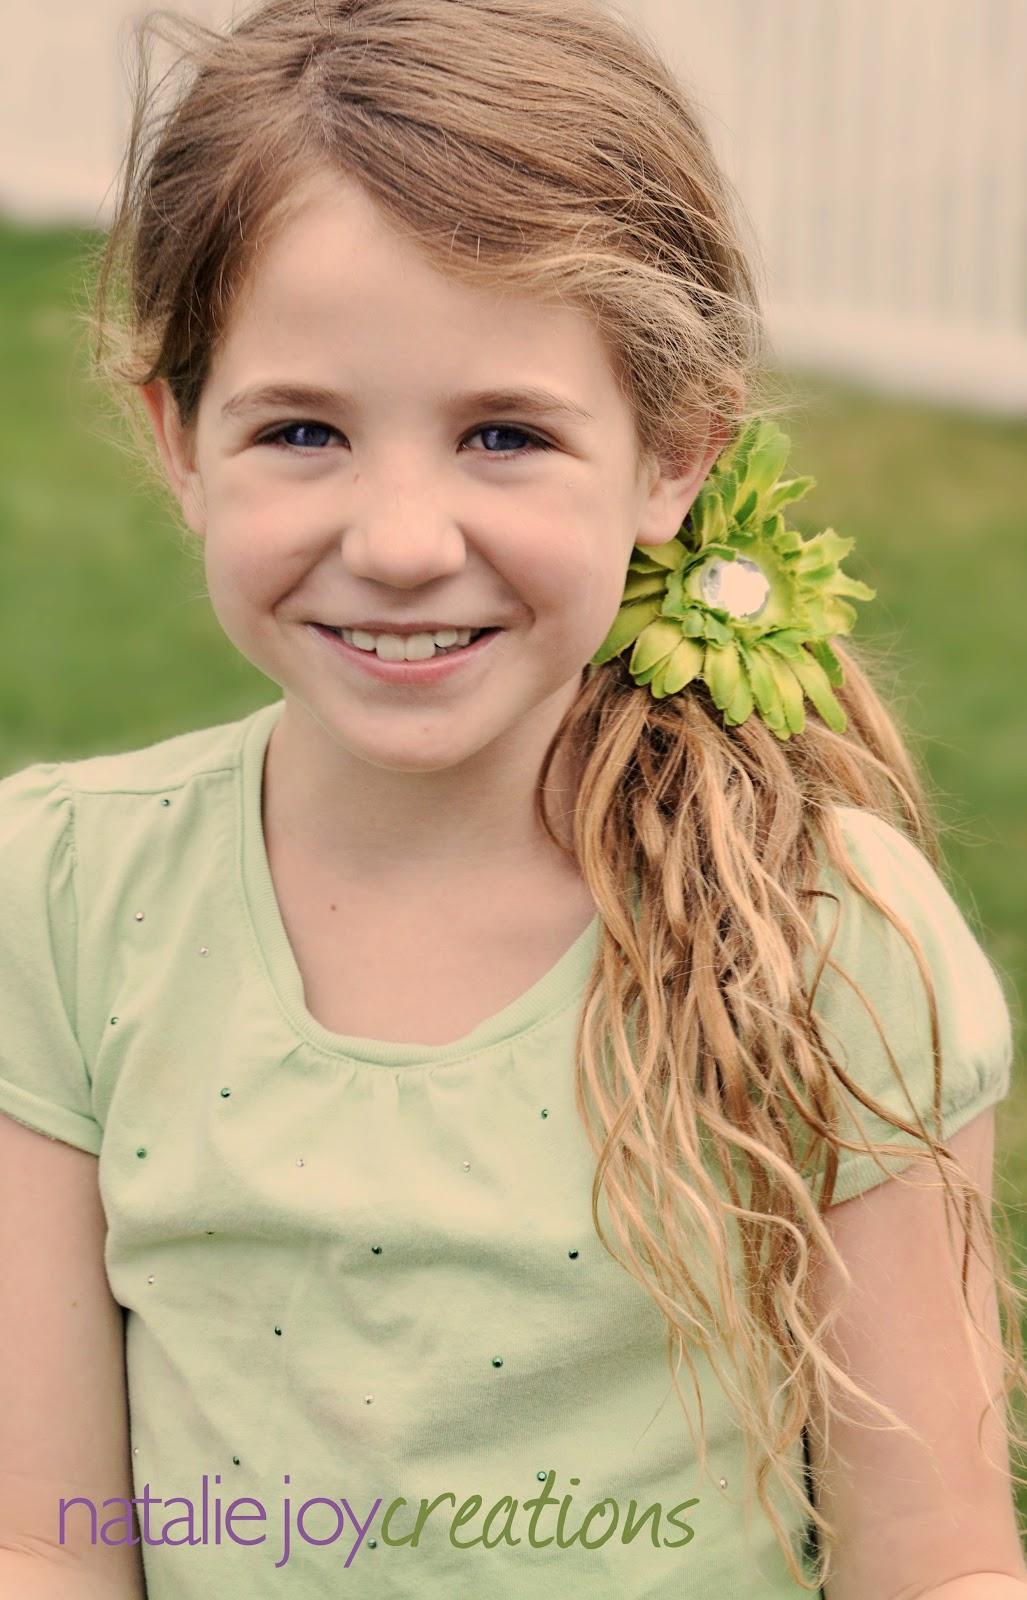 Natalie Joy Creations 8 Year Old Portraits